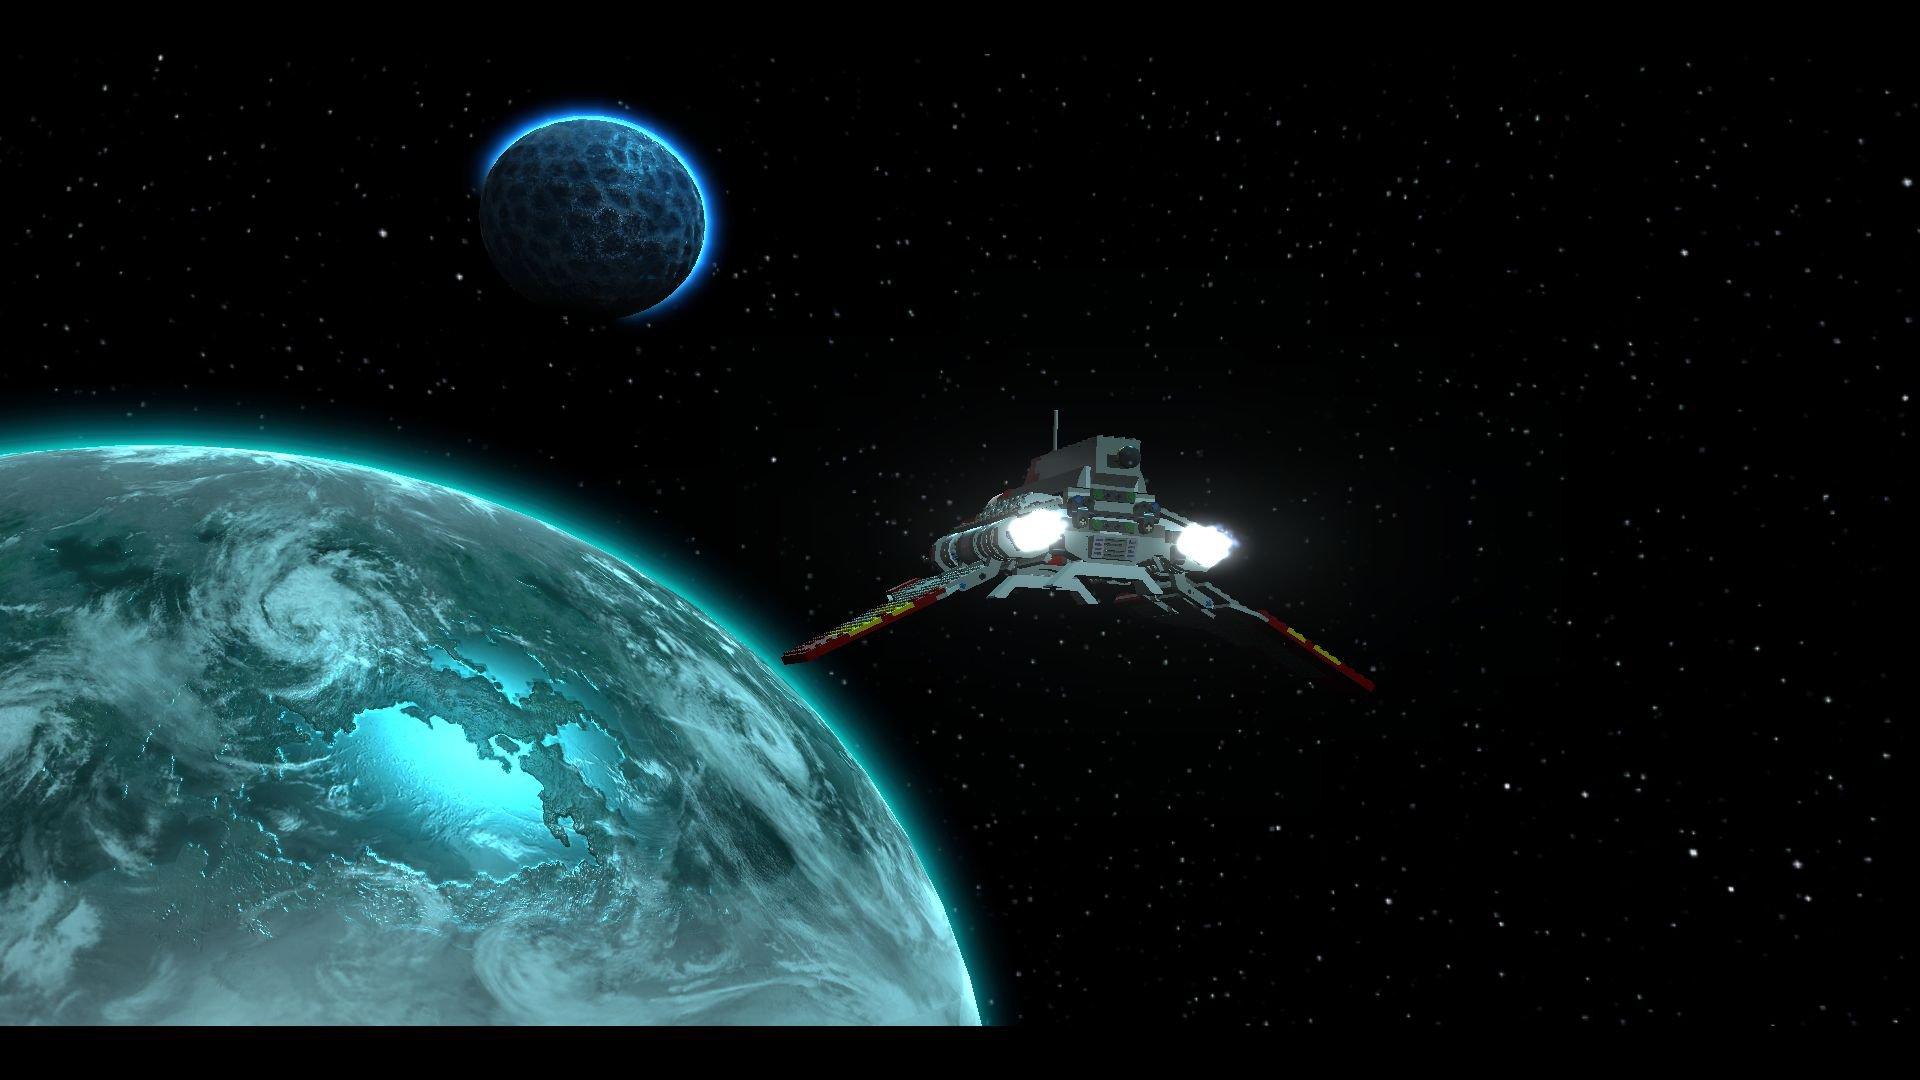 LEGO Star Wars III The Clone Wars 9